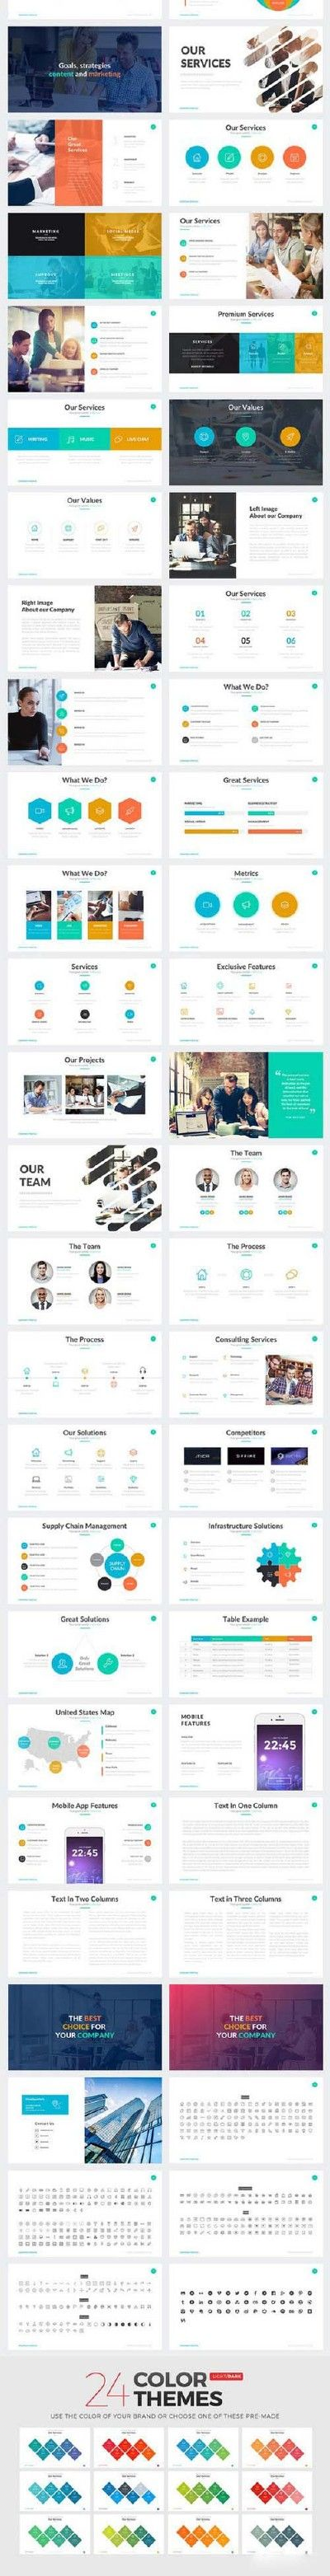 17 best ideas about Company Profile on Pinterest | Company profile ...